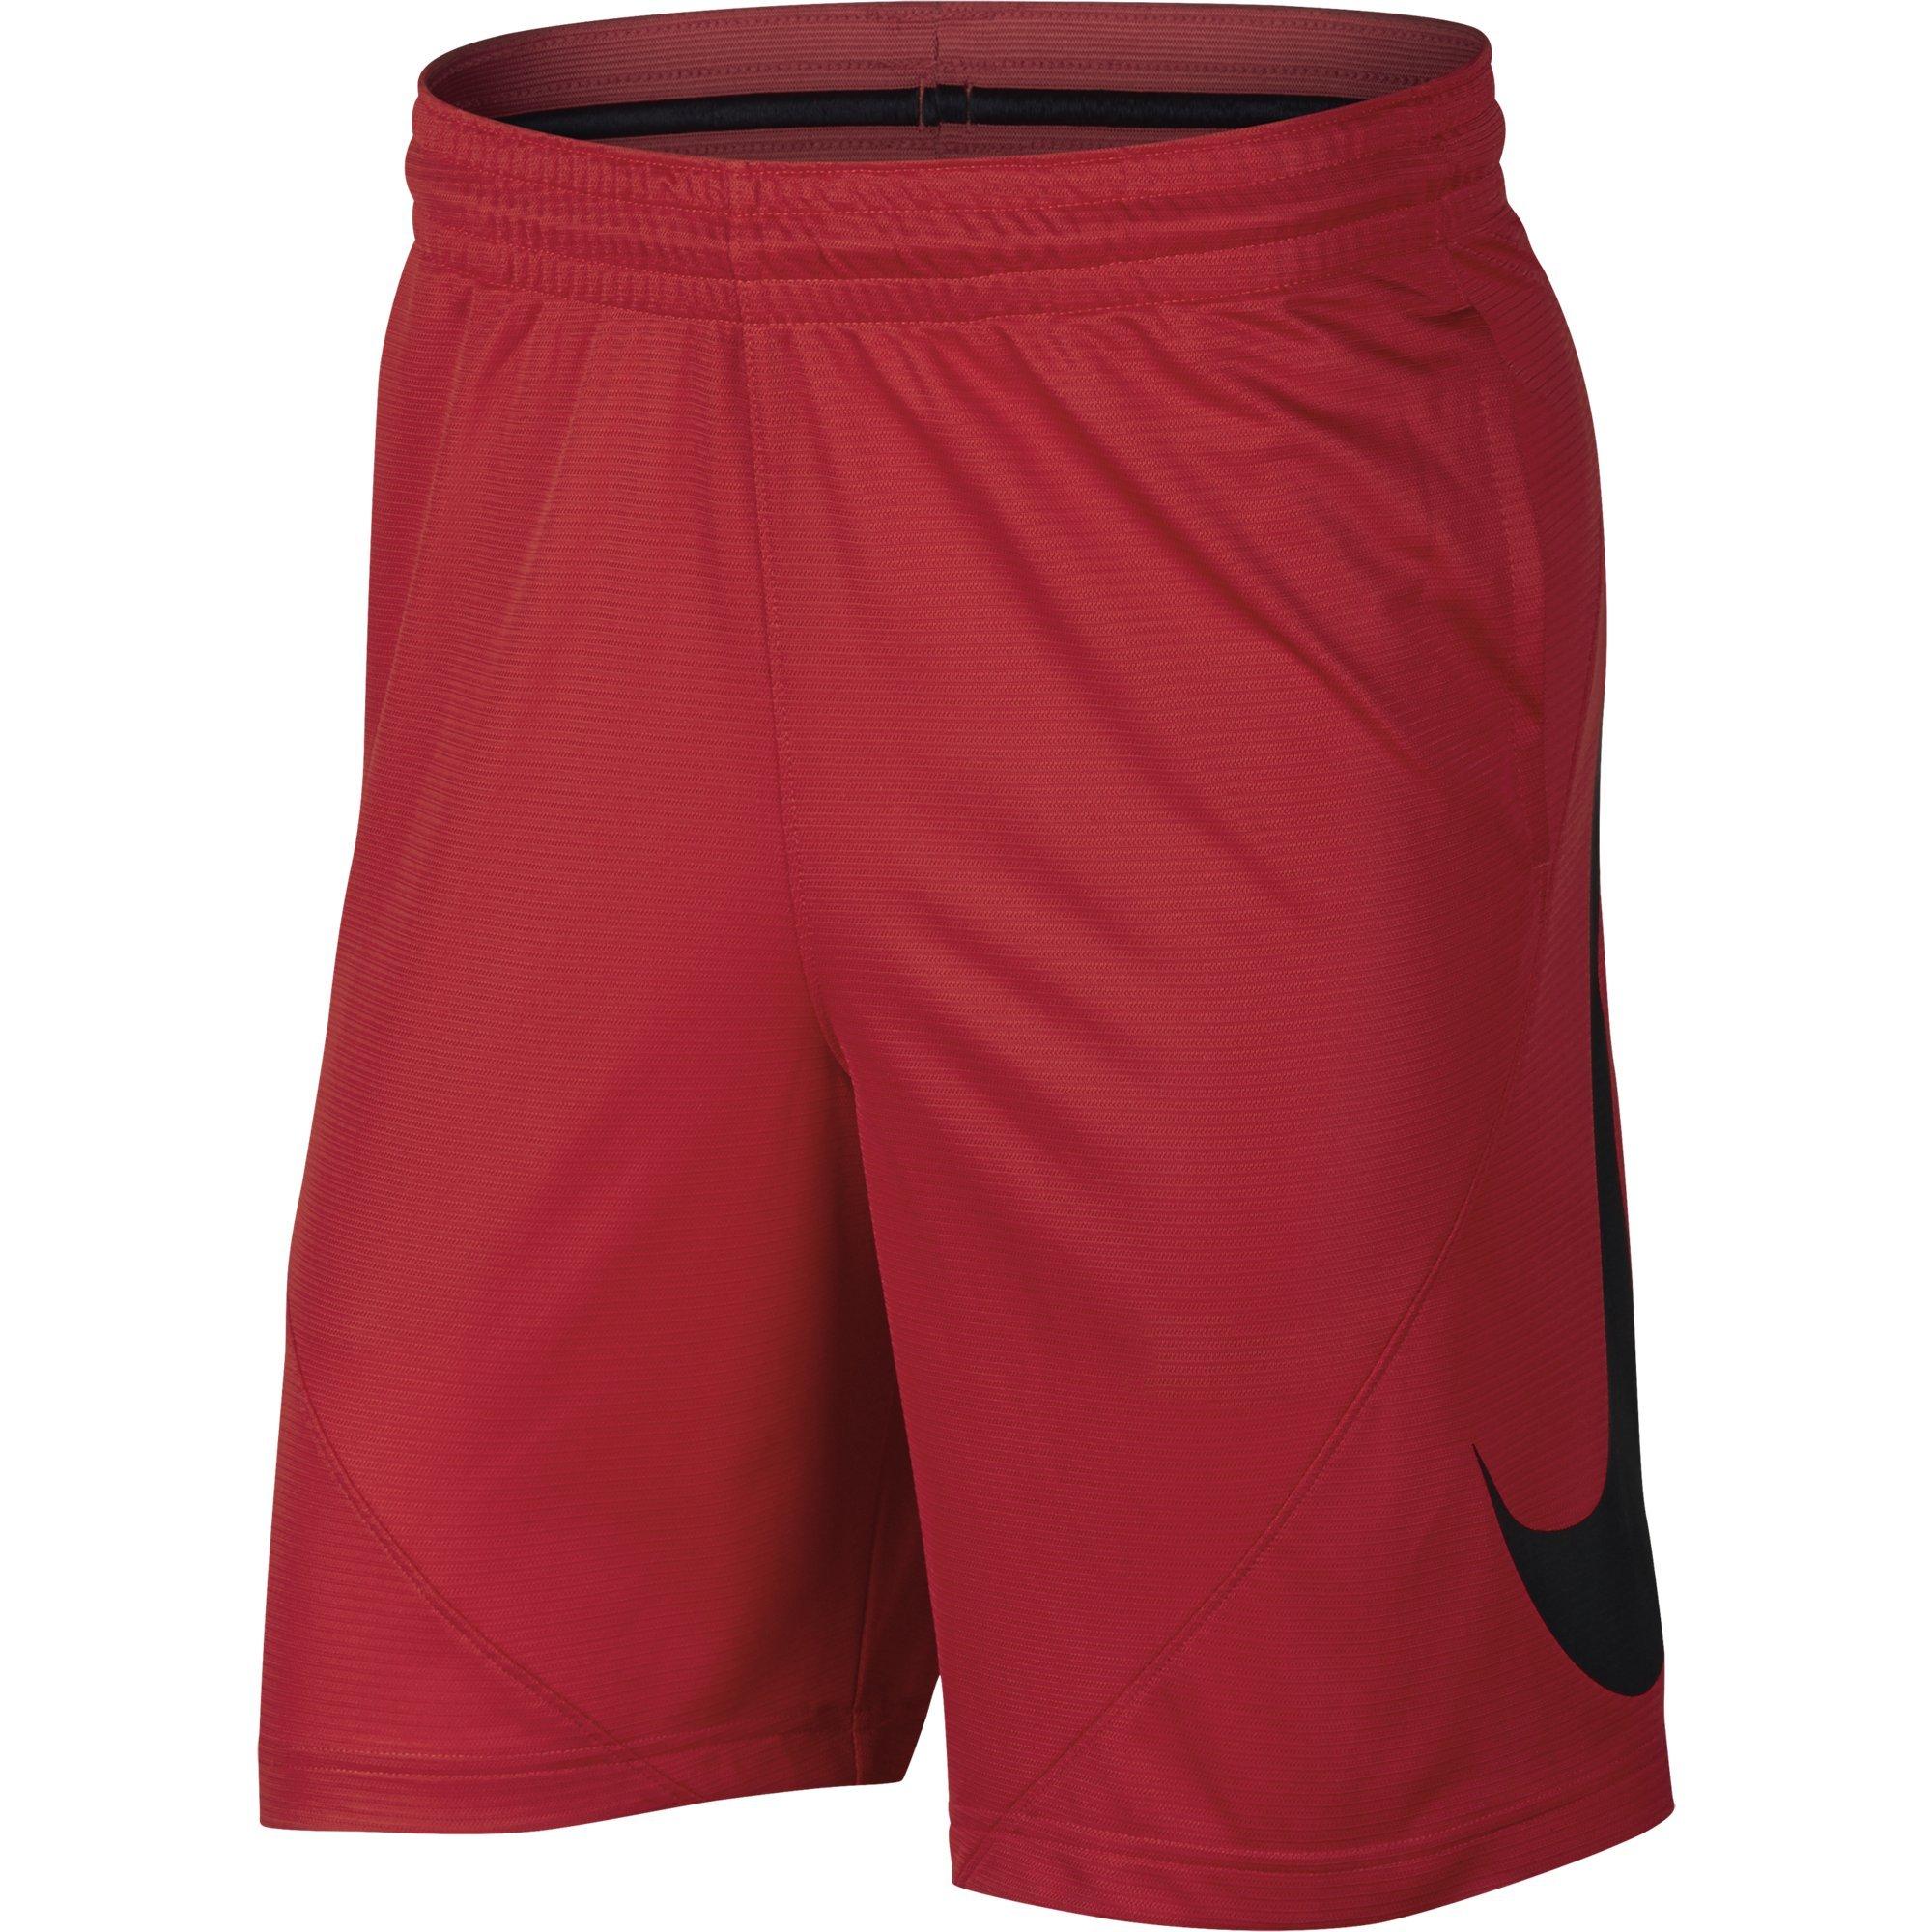 NIKE Men's HBR Basketball Shorts, University Red/Black/White/White, Small